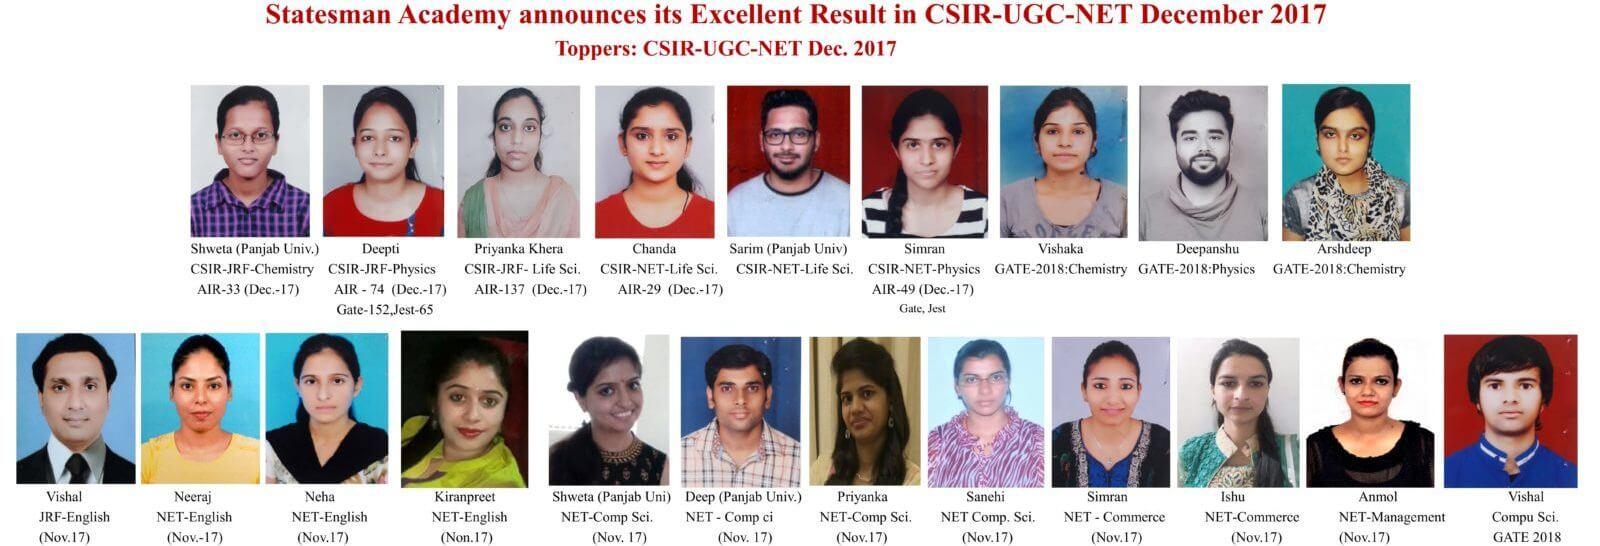 csir net life science coaching in chandigarh statesman academy